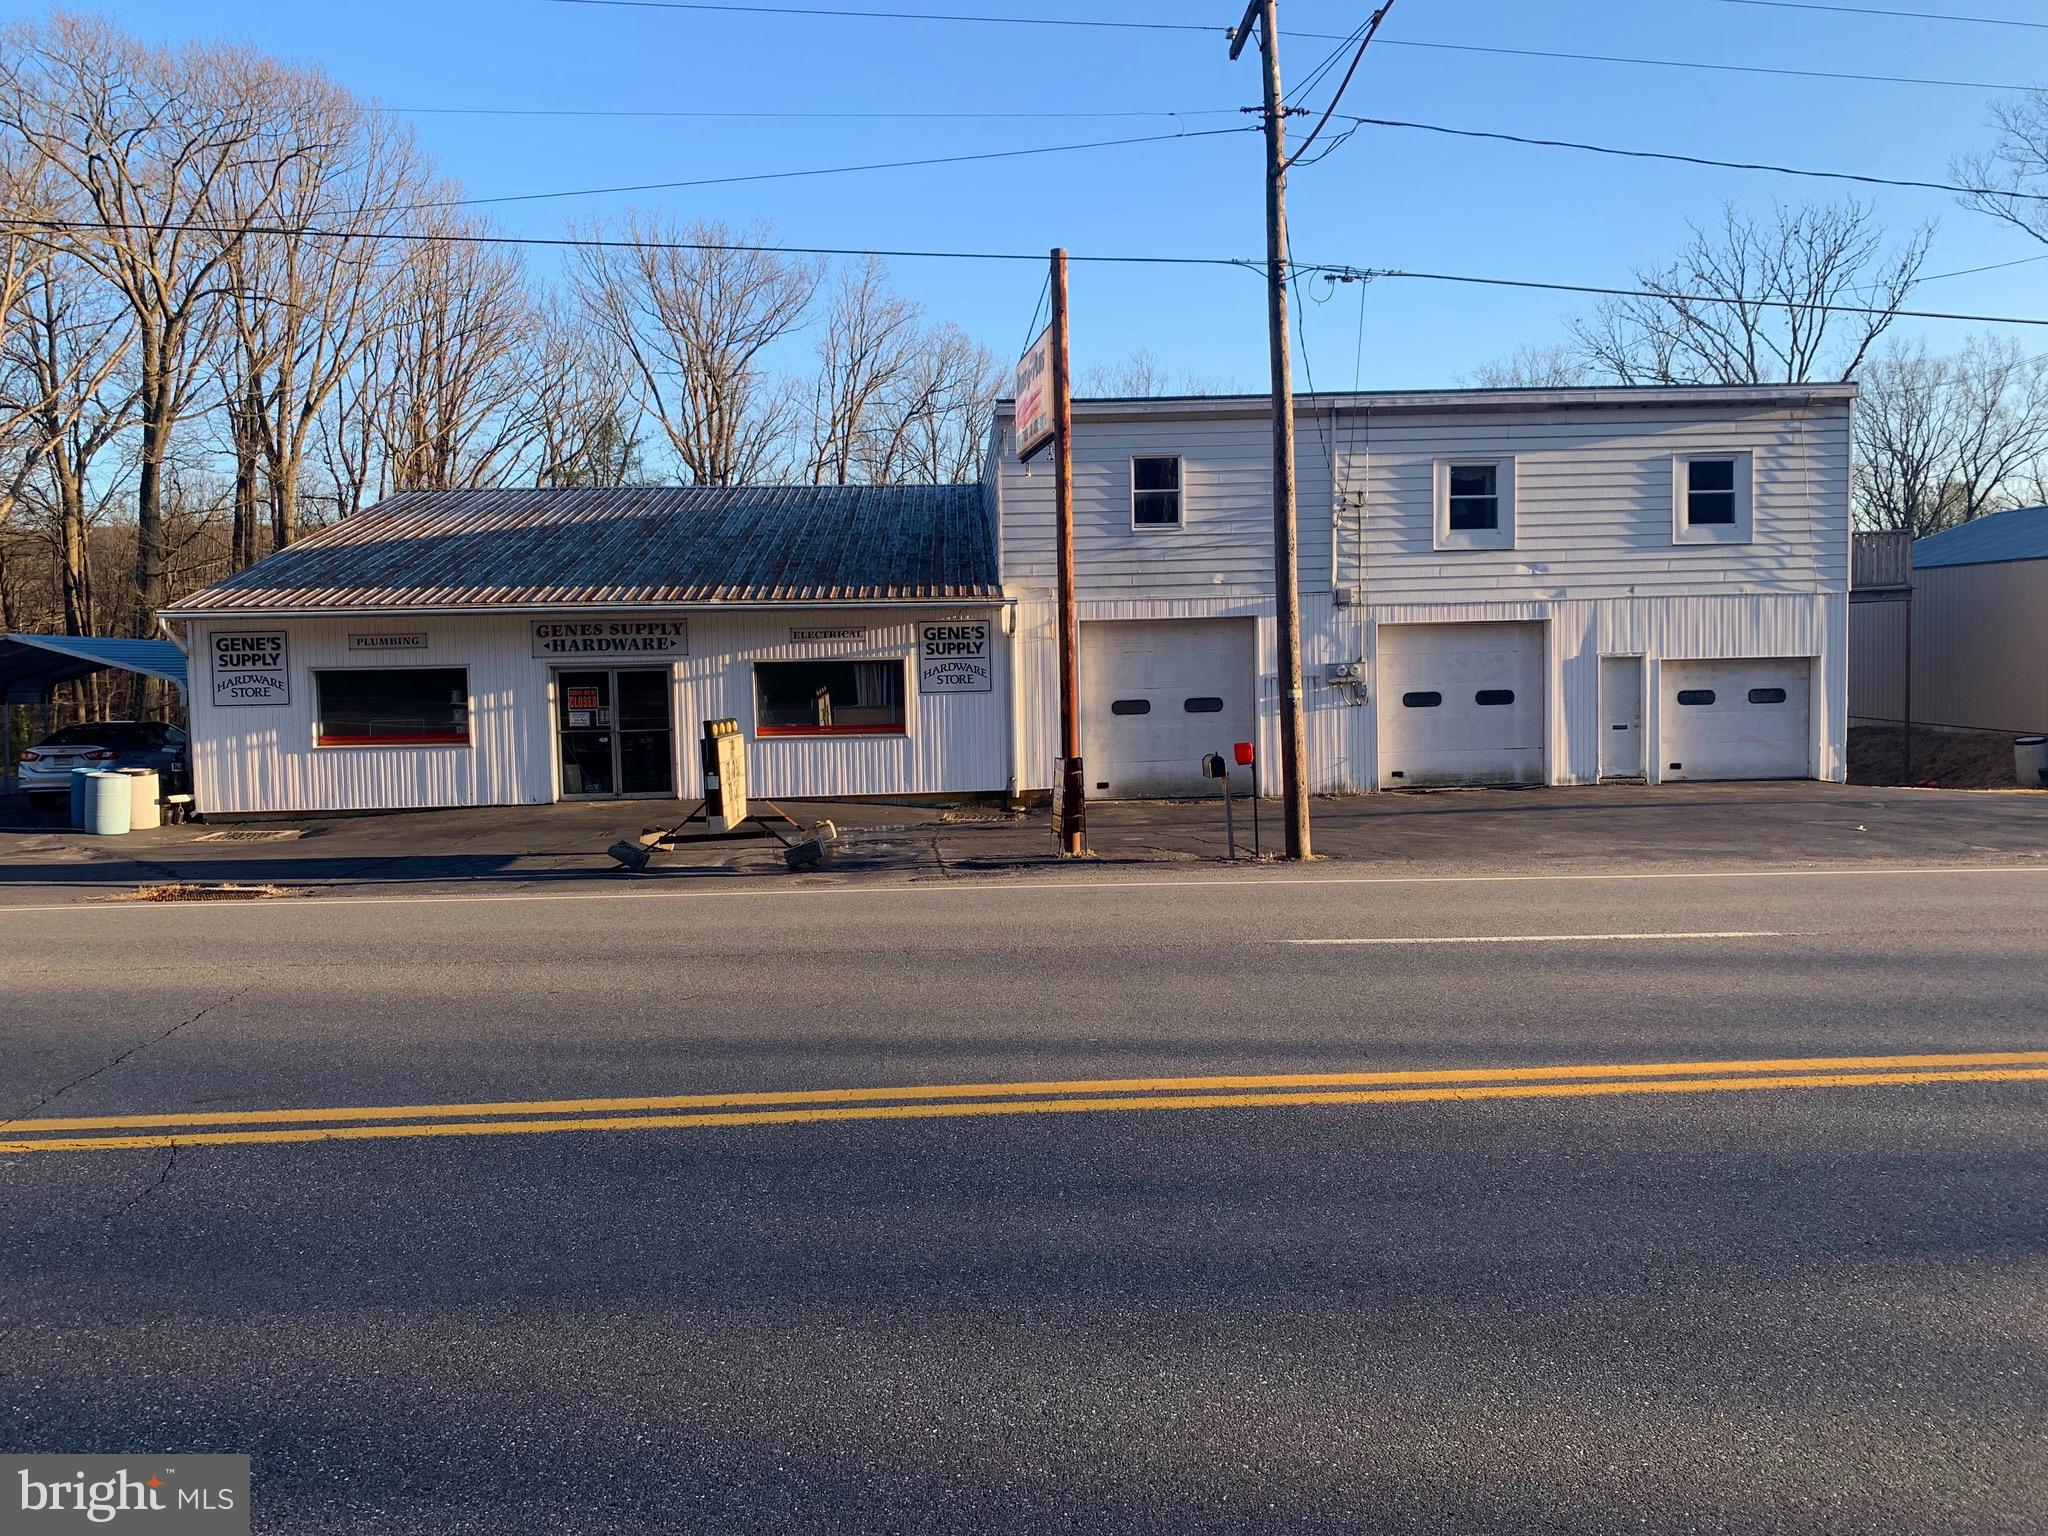 635 Fountain Street, Ashland, PA 17921